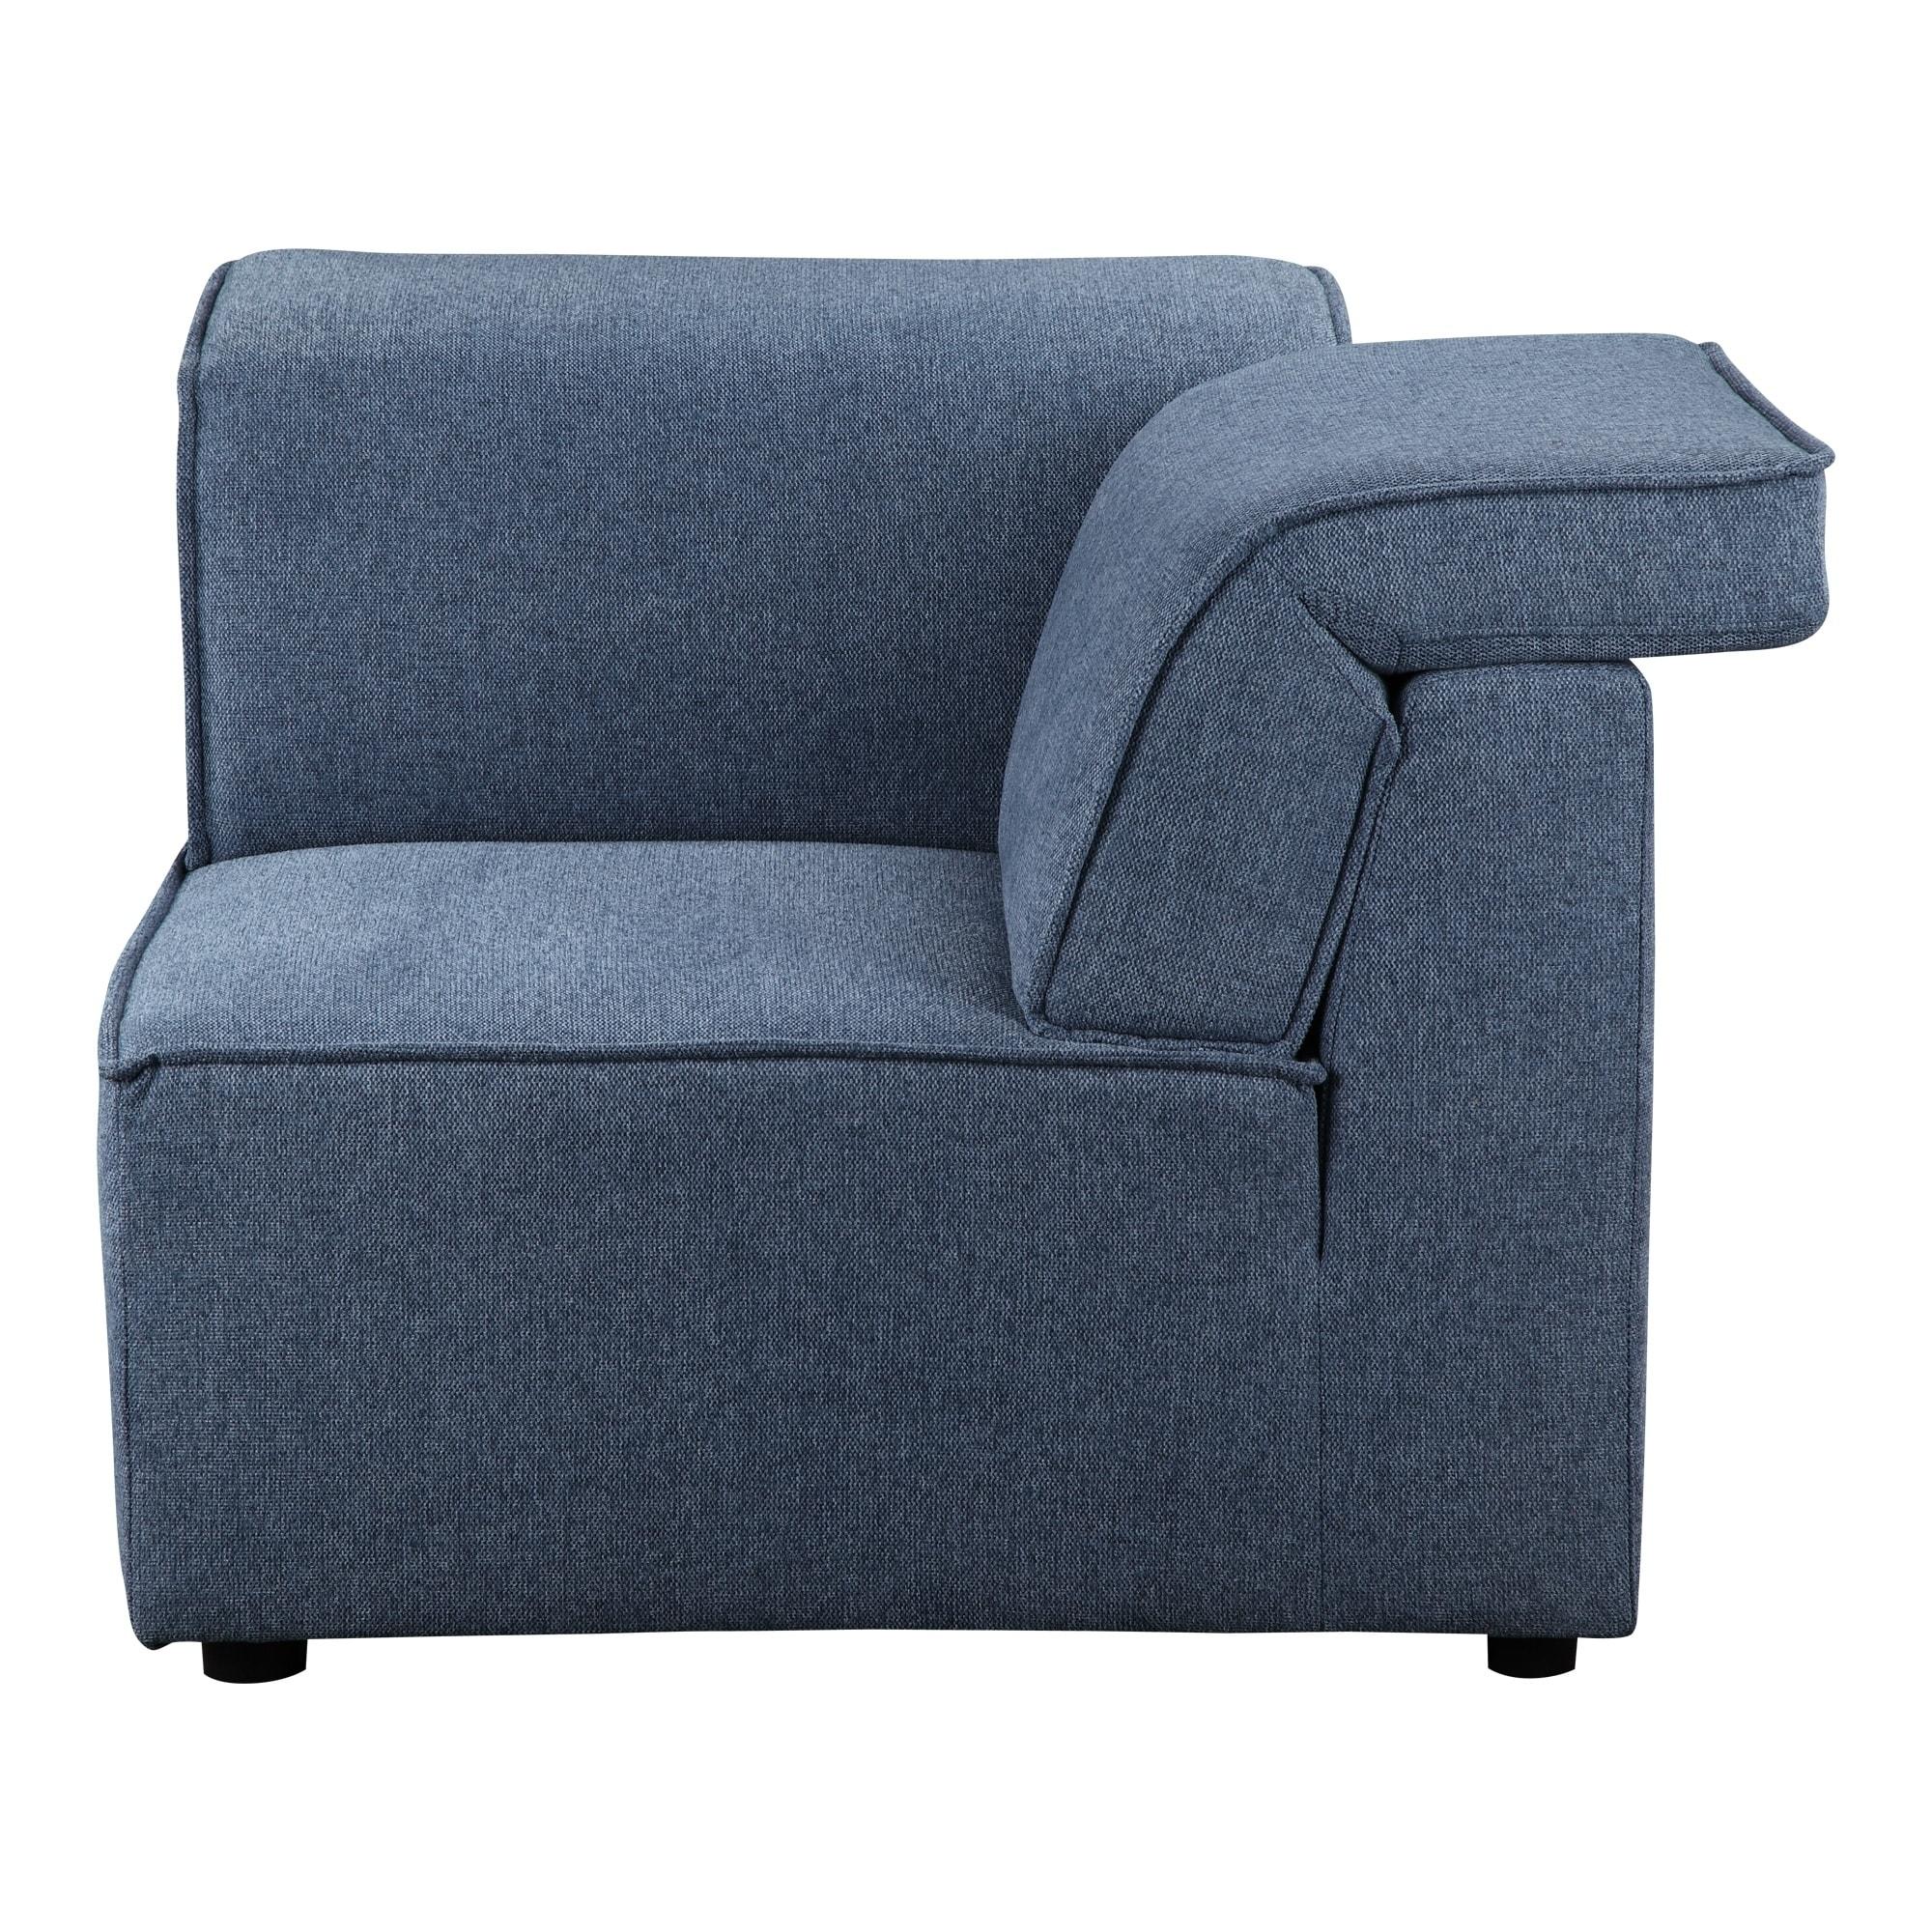 Shop Aurelle Home Riffle Navy Blue Corner Modular Sofa Element - On ...